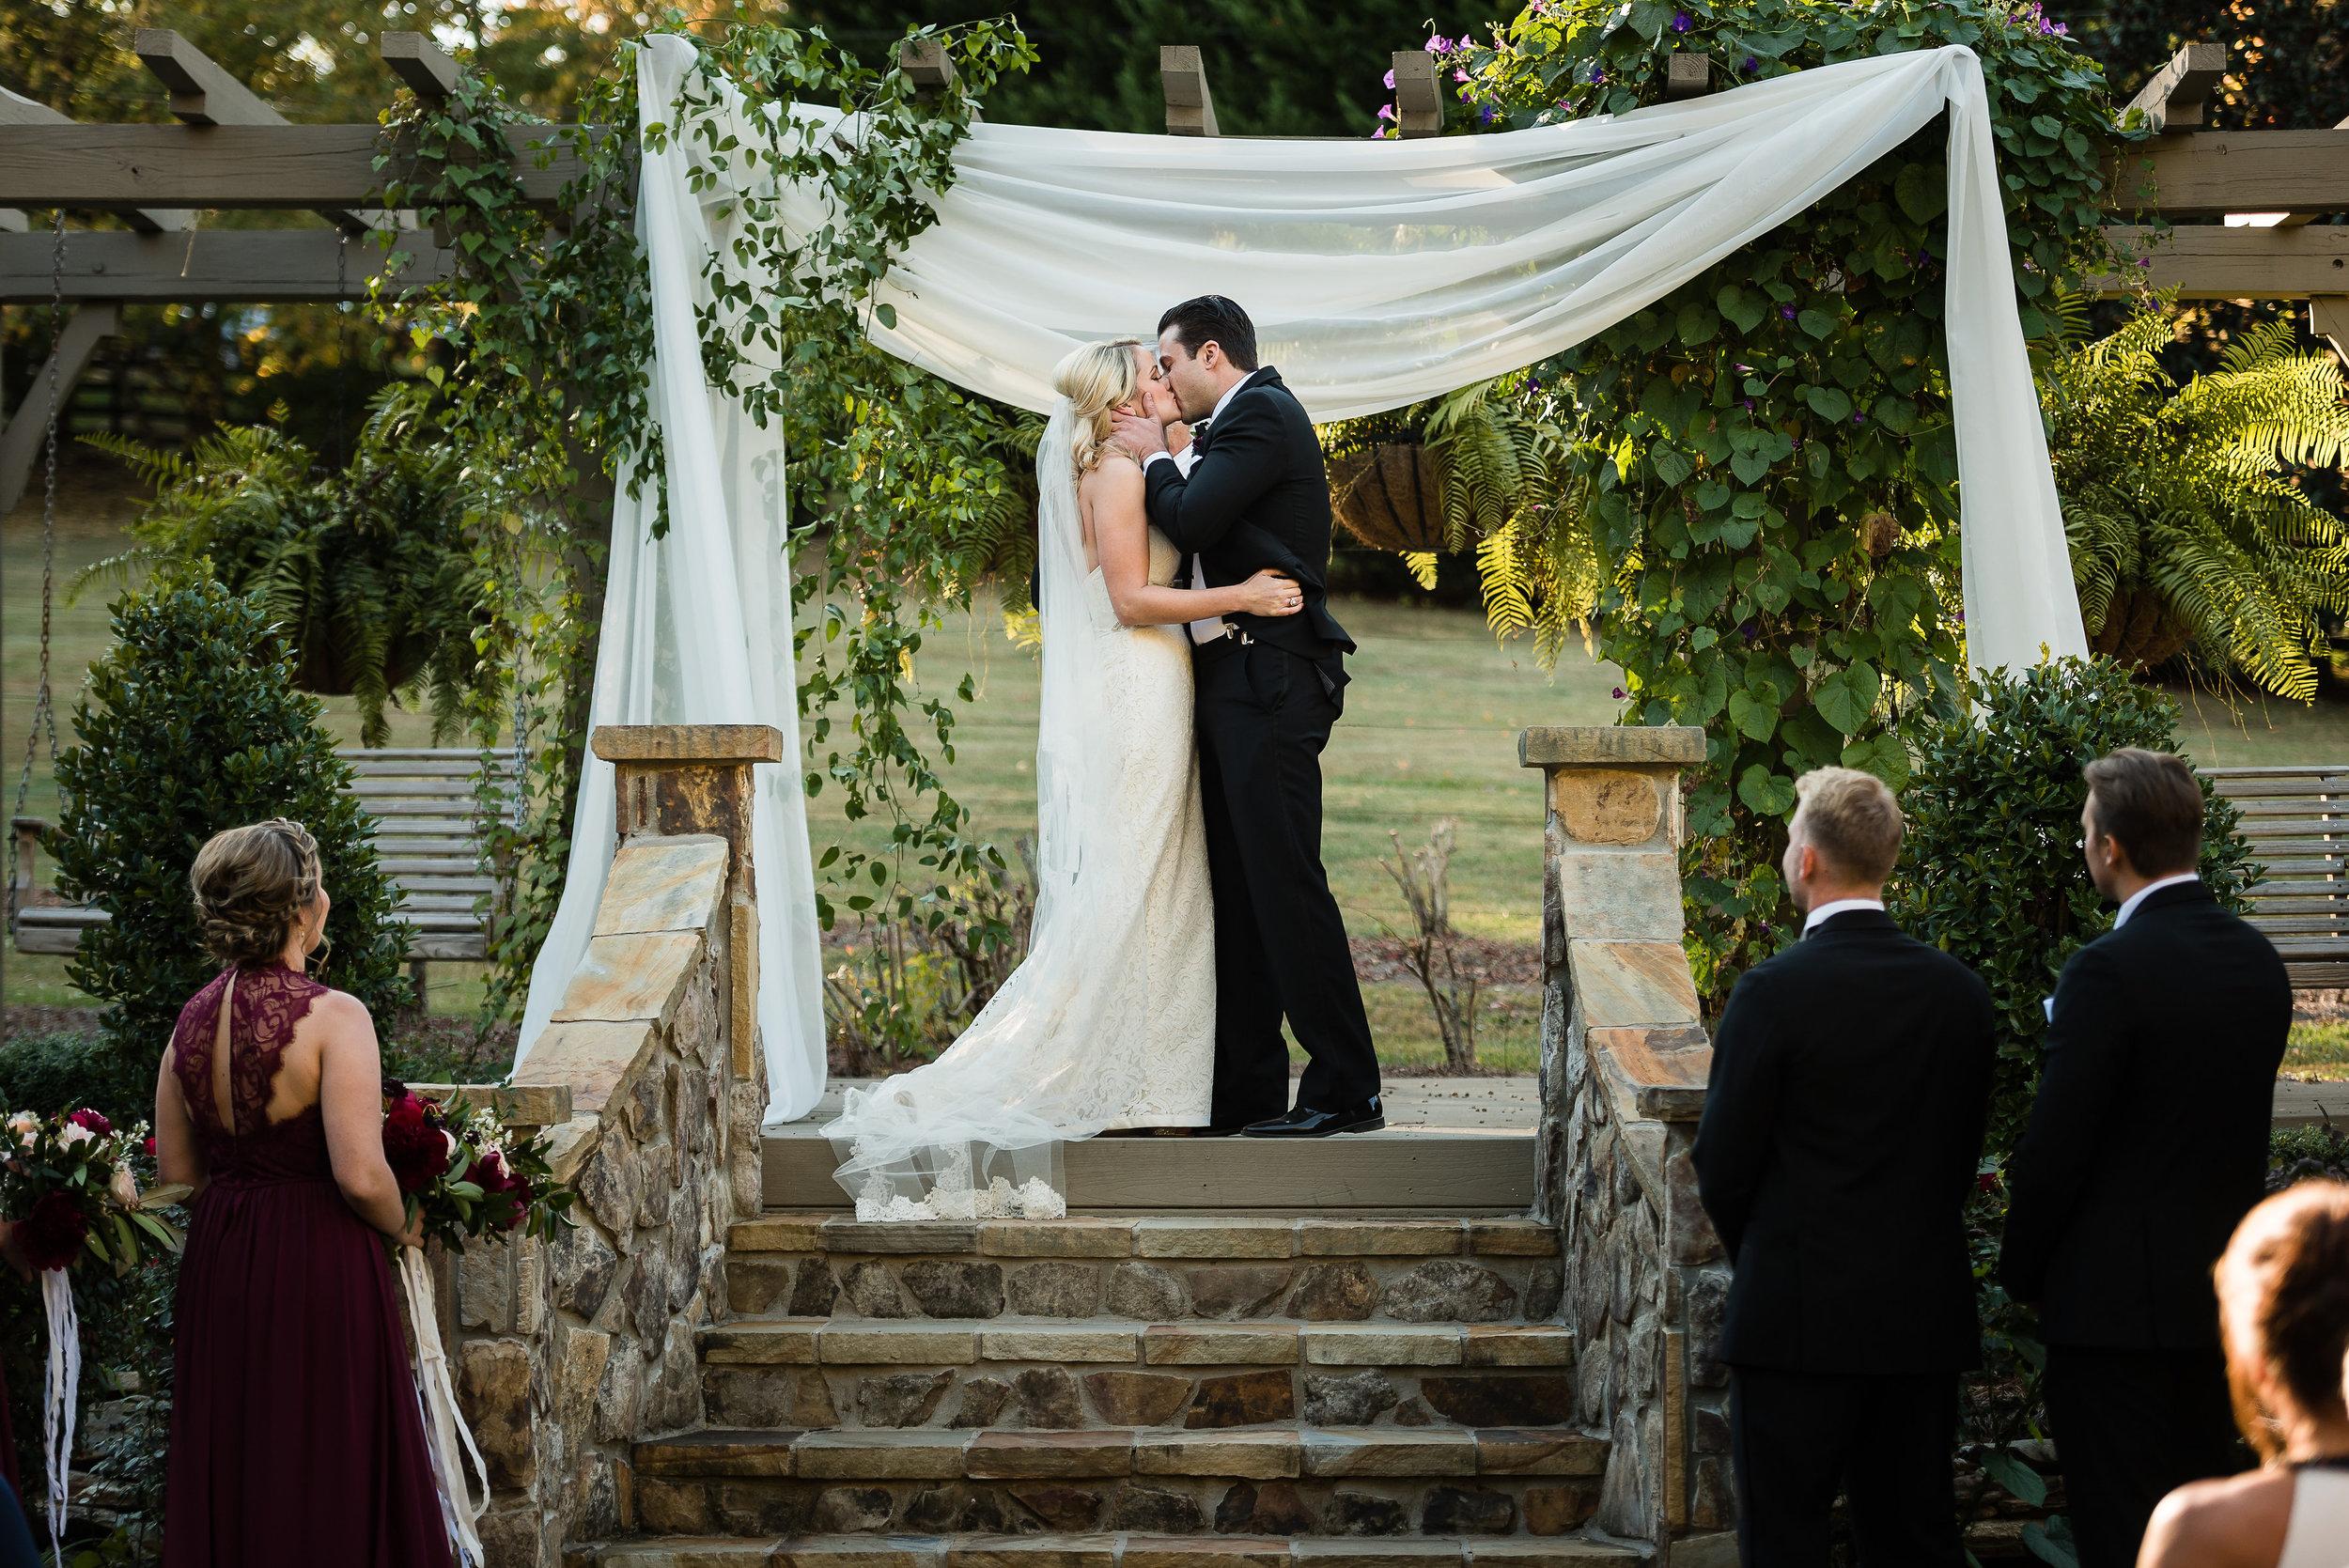 20161022_hawkesdene_fall_wedding_photos_0985.jpg